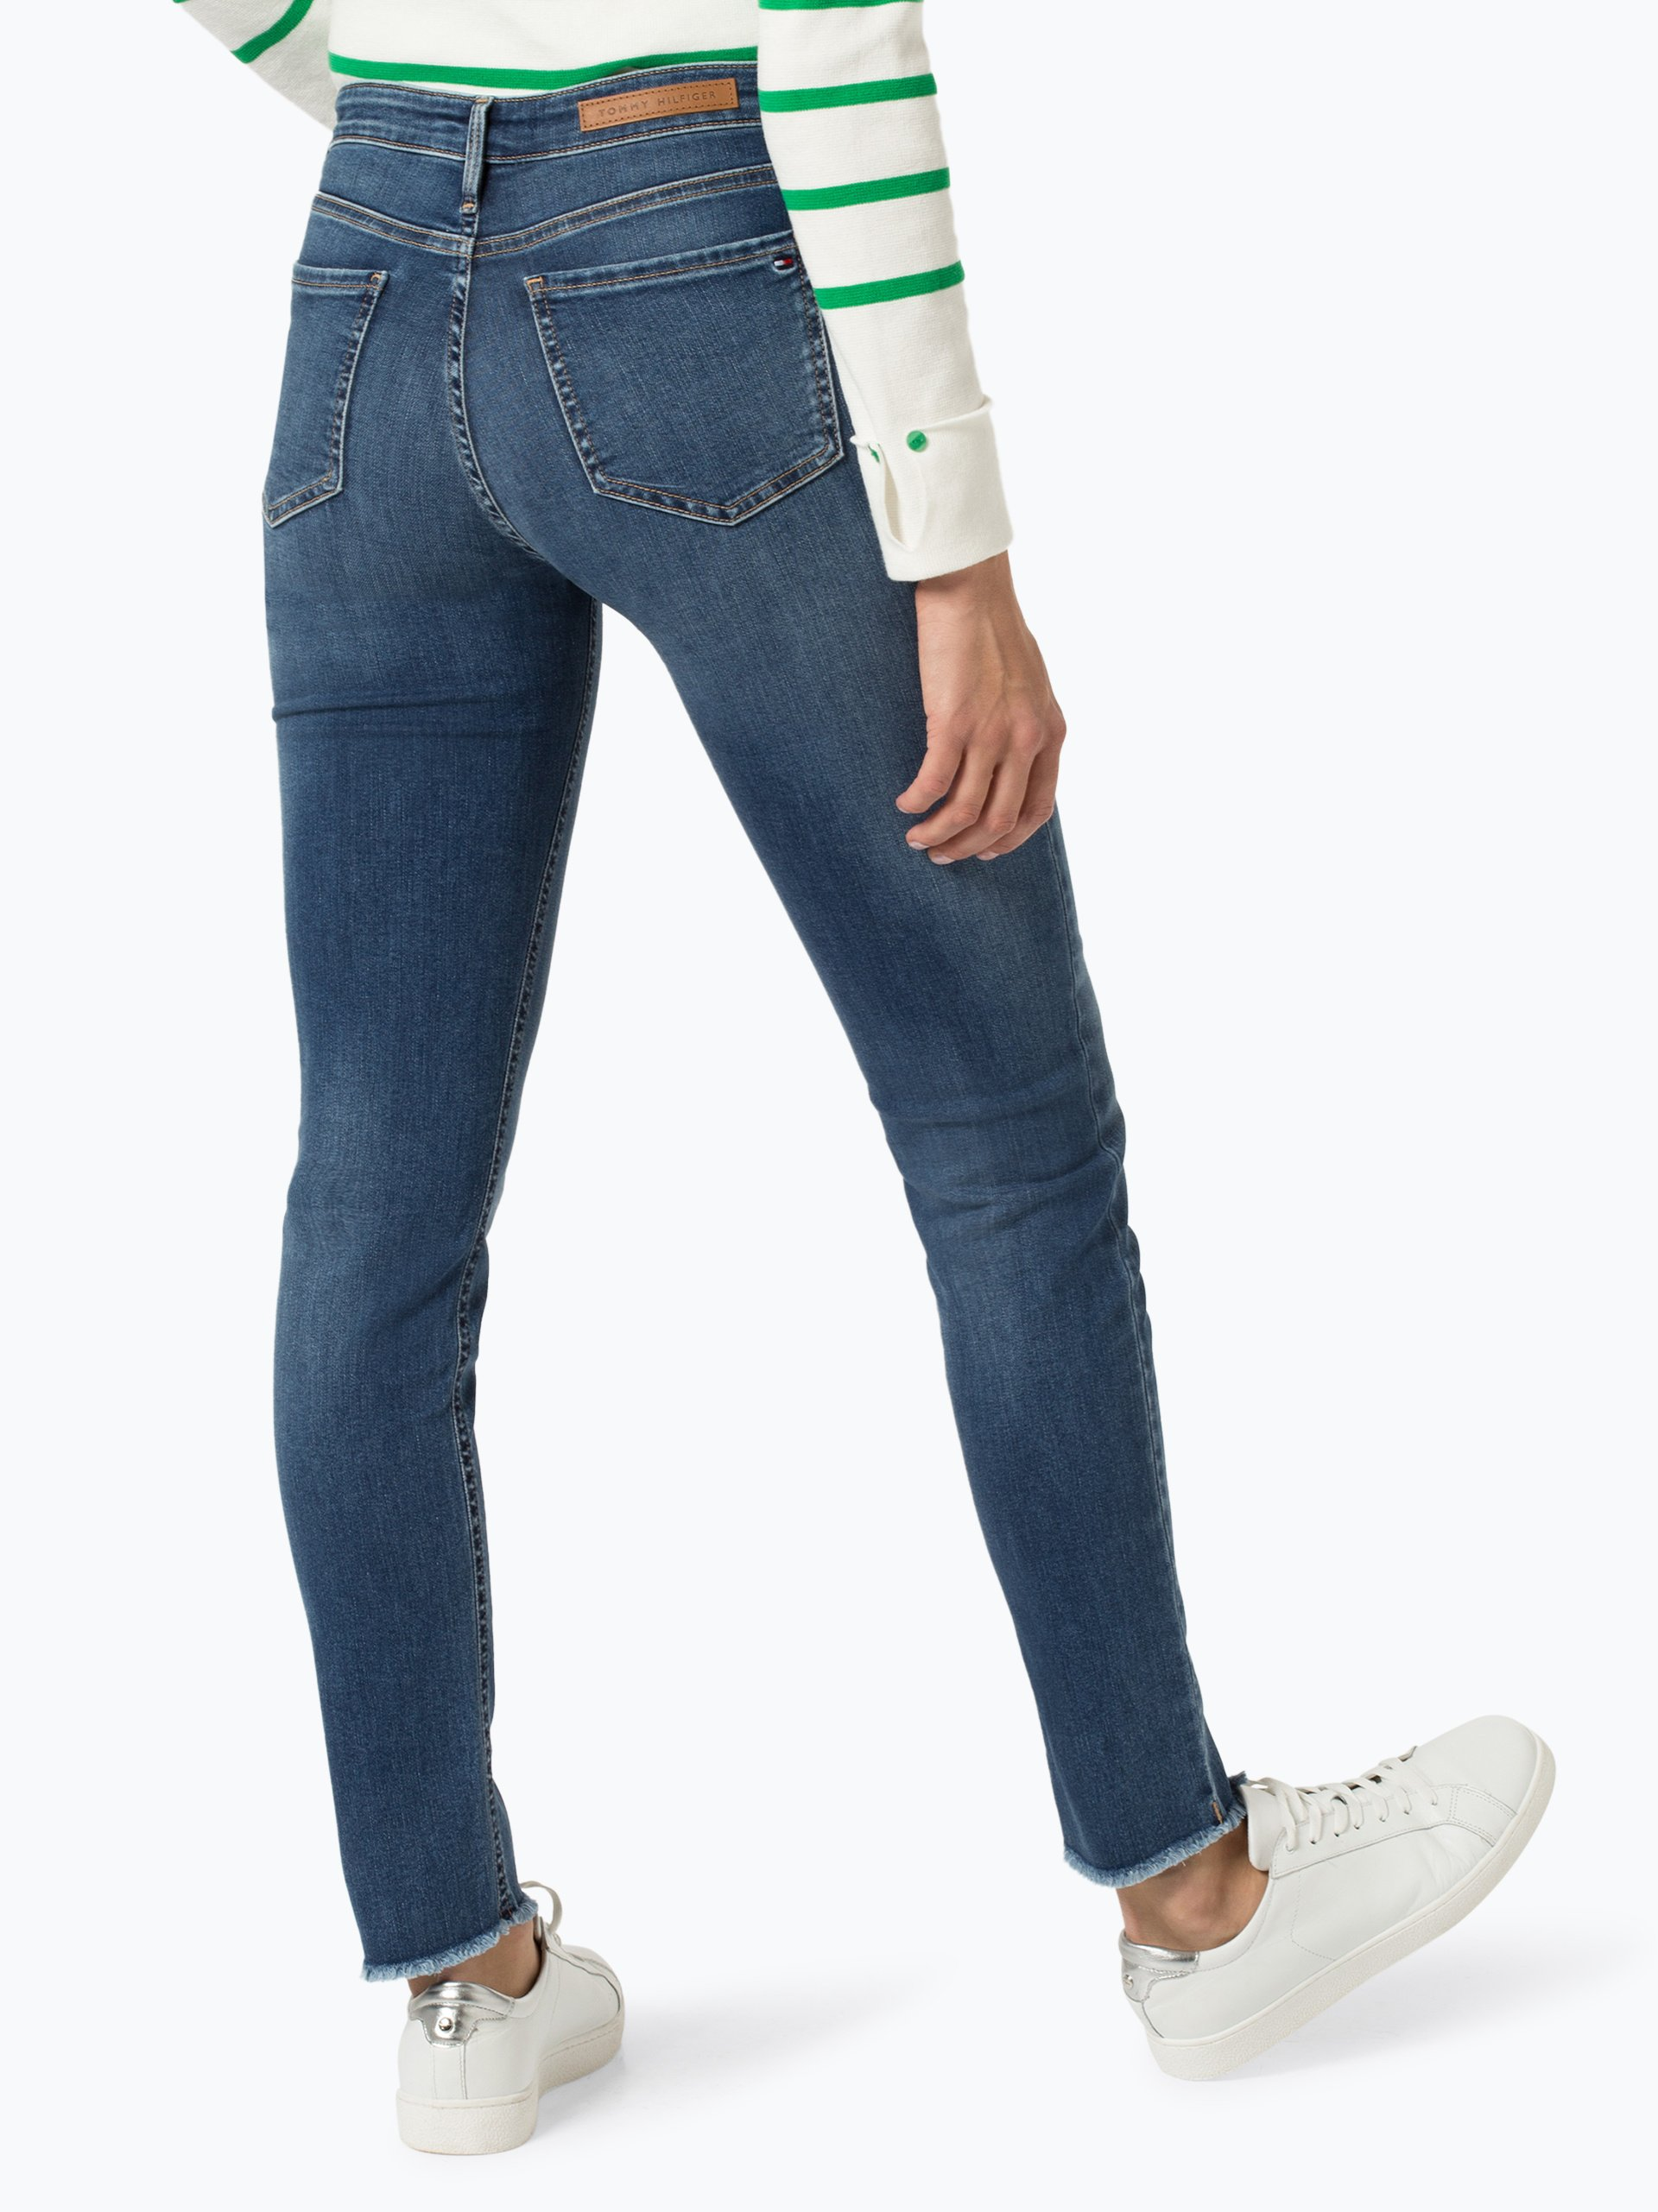 Tommy Hilfiger Damen Jeans - Riverpoint